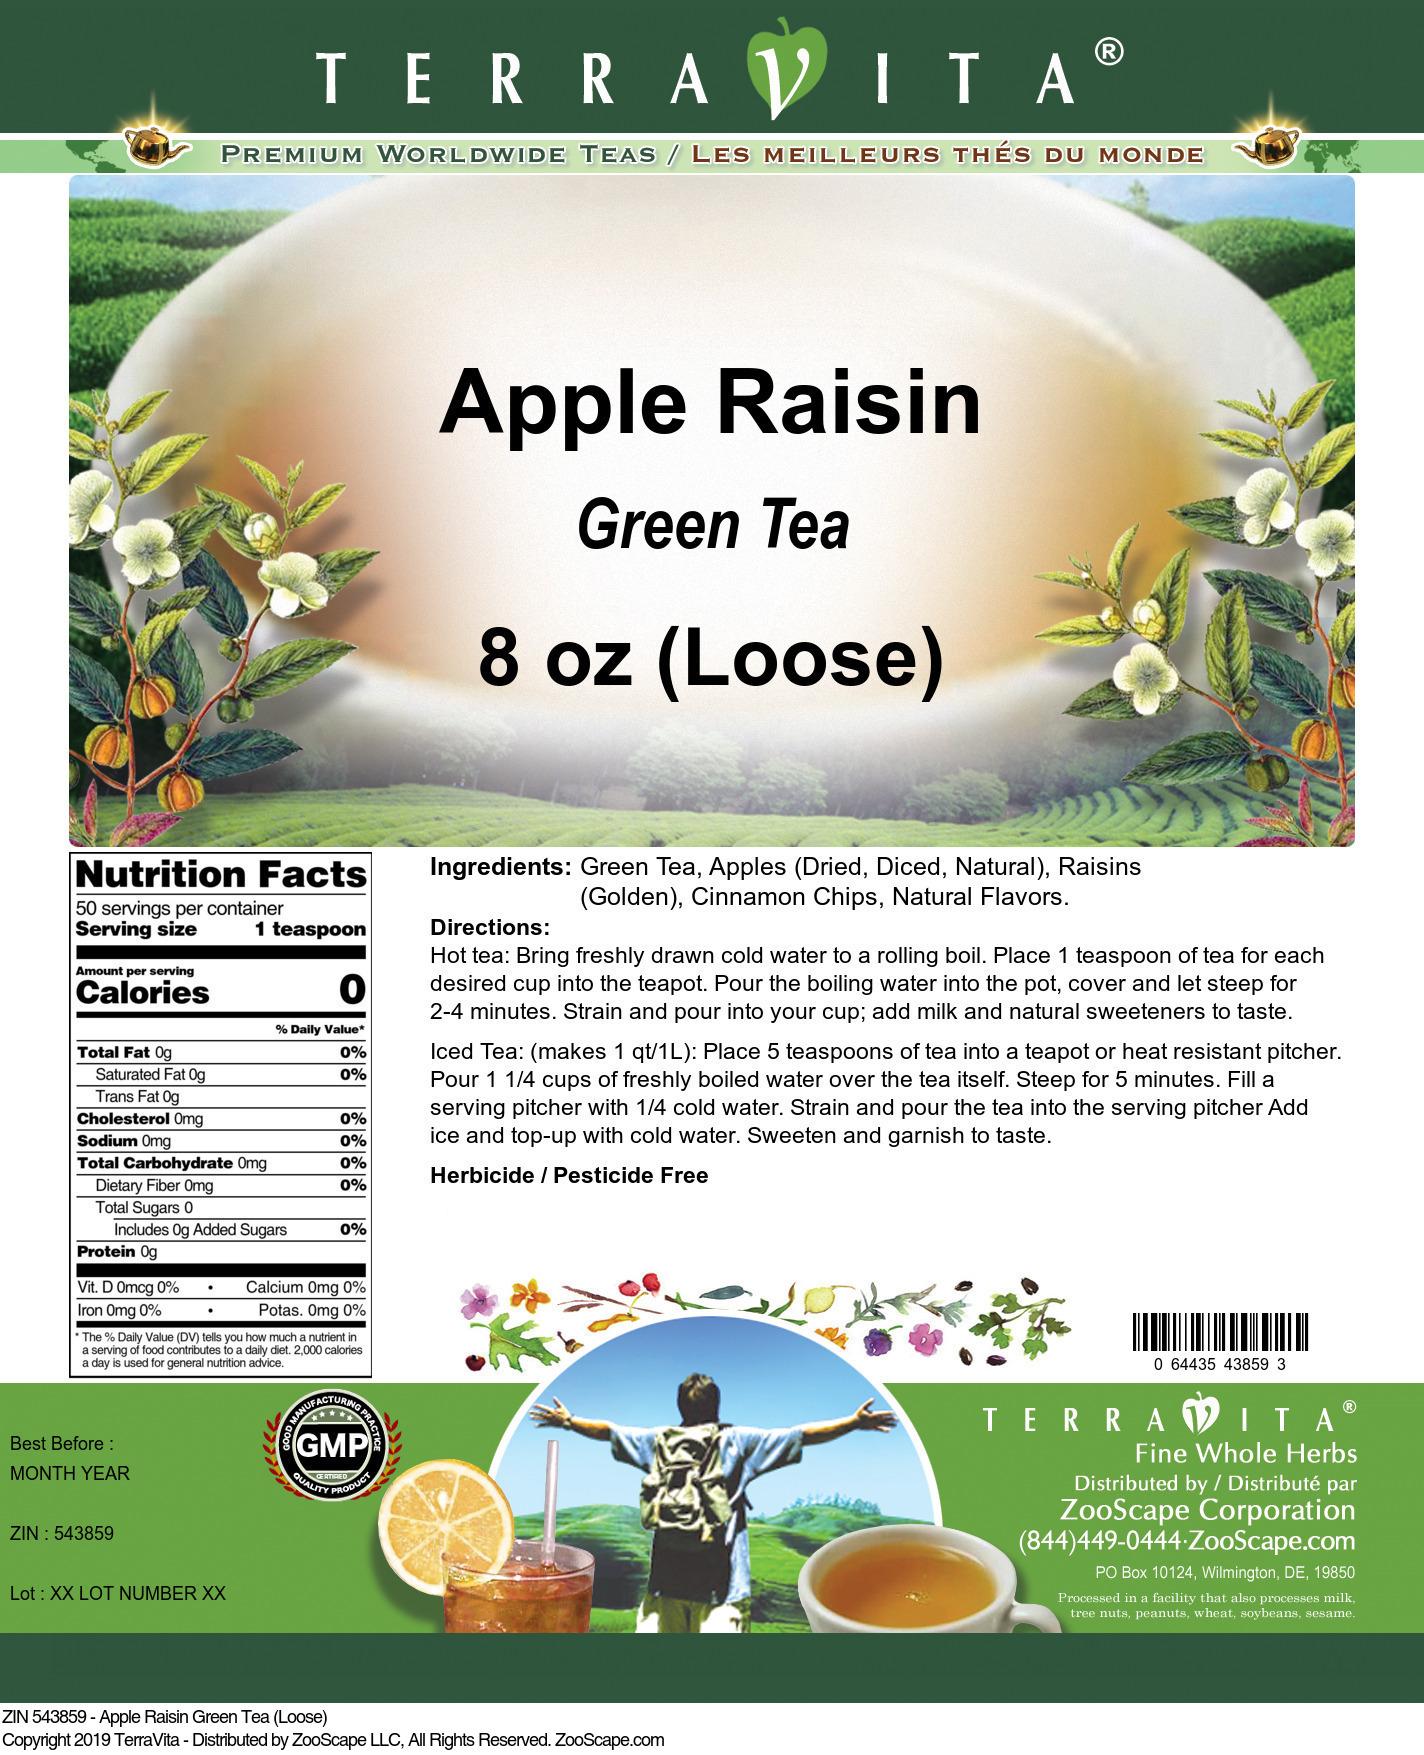 Apple Raisin Green Tea (Loose)